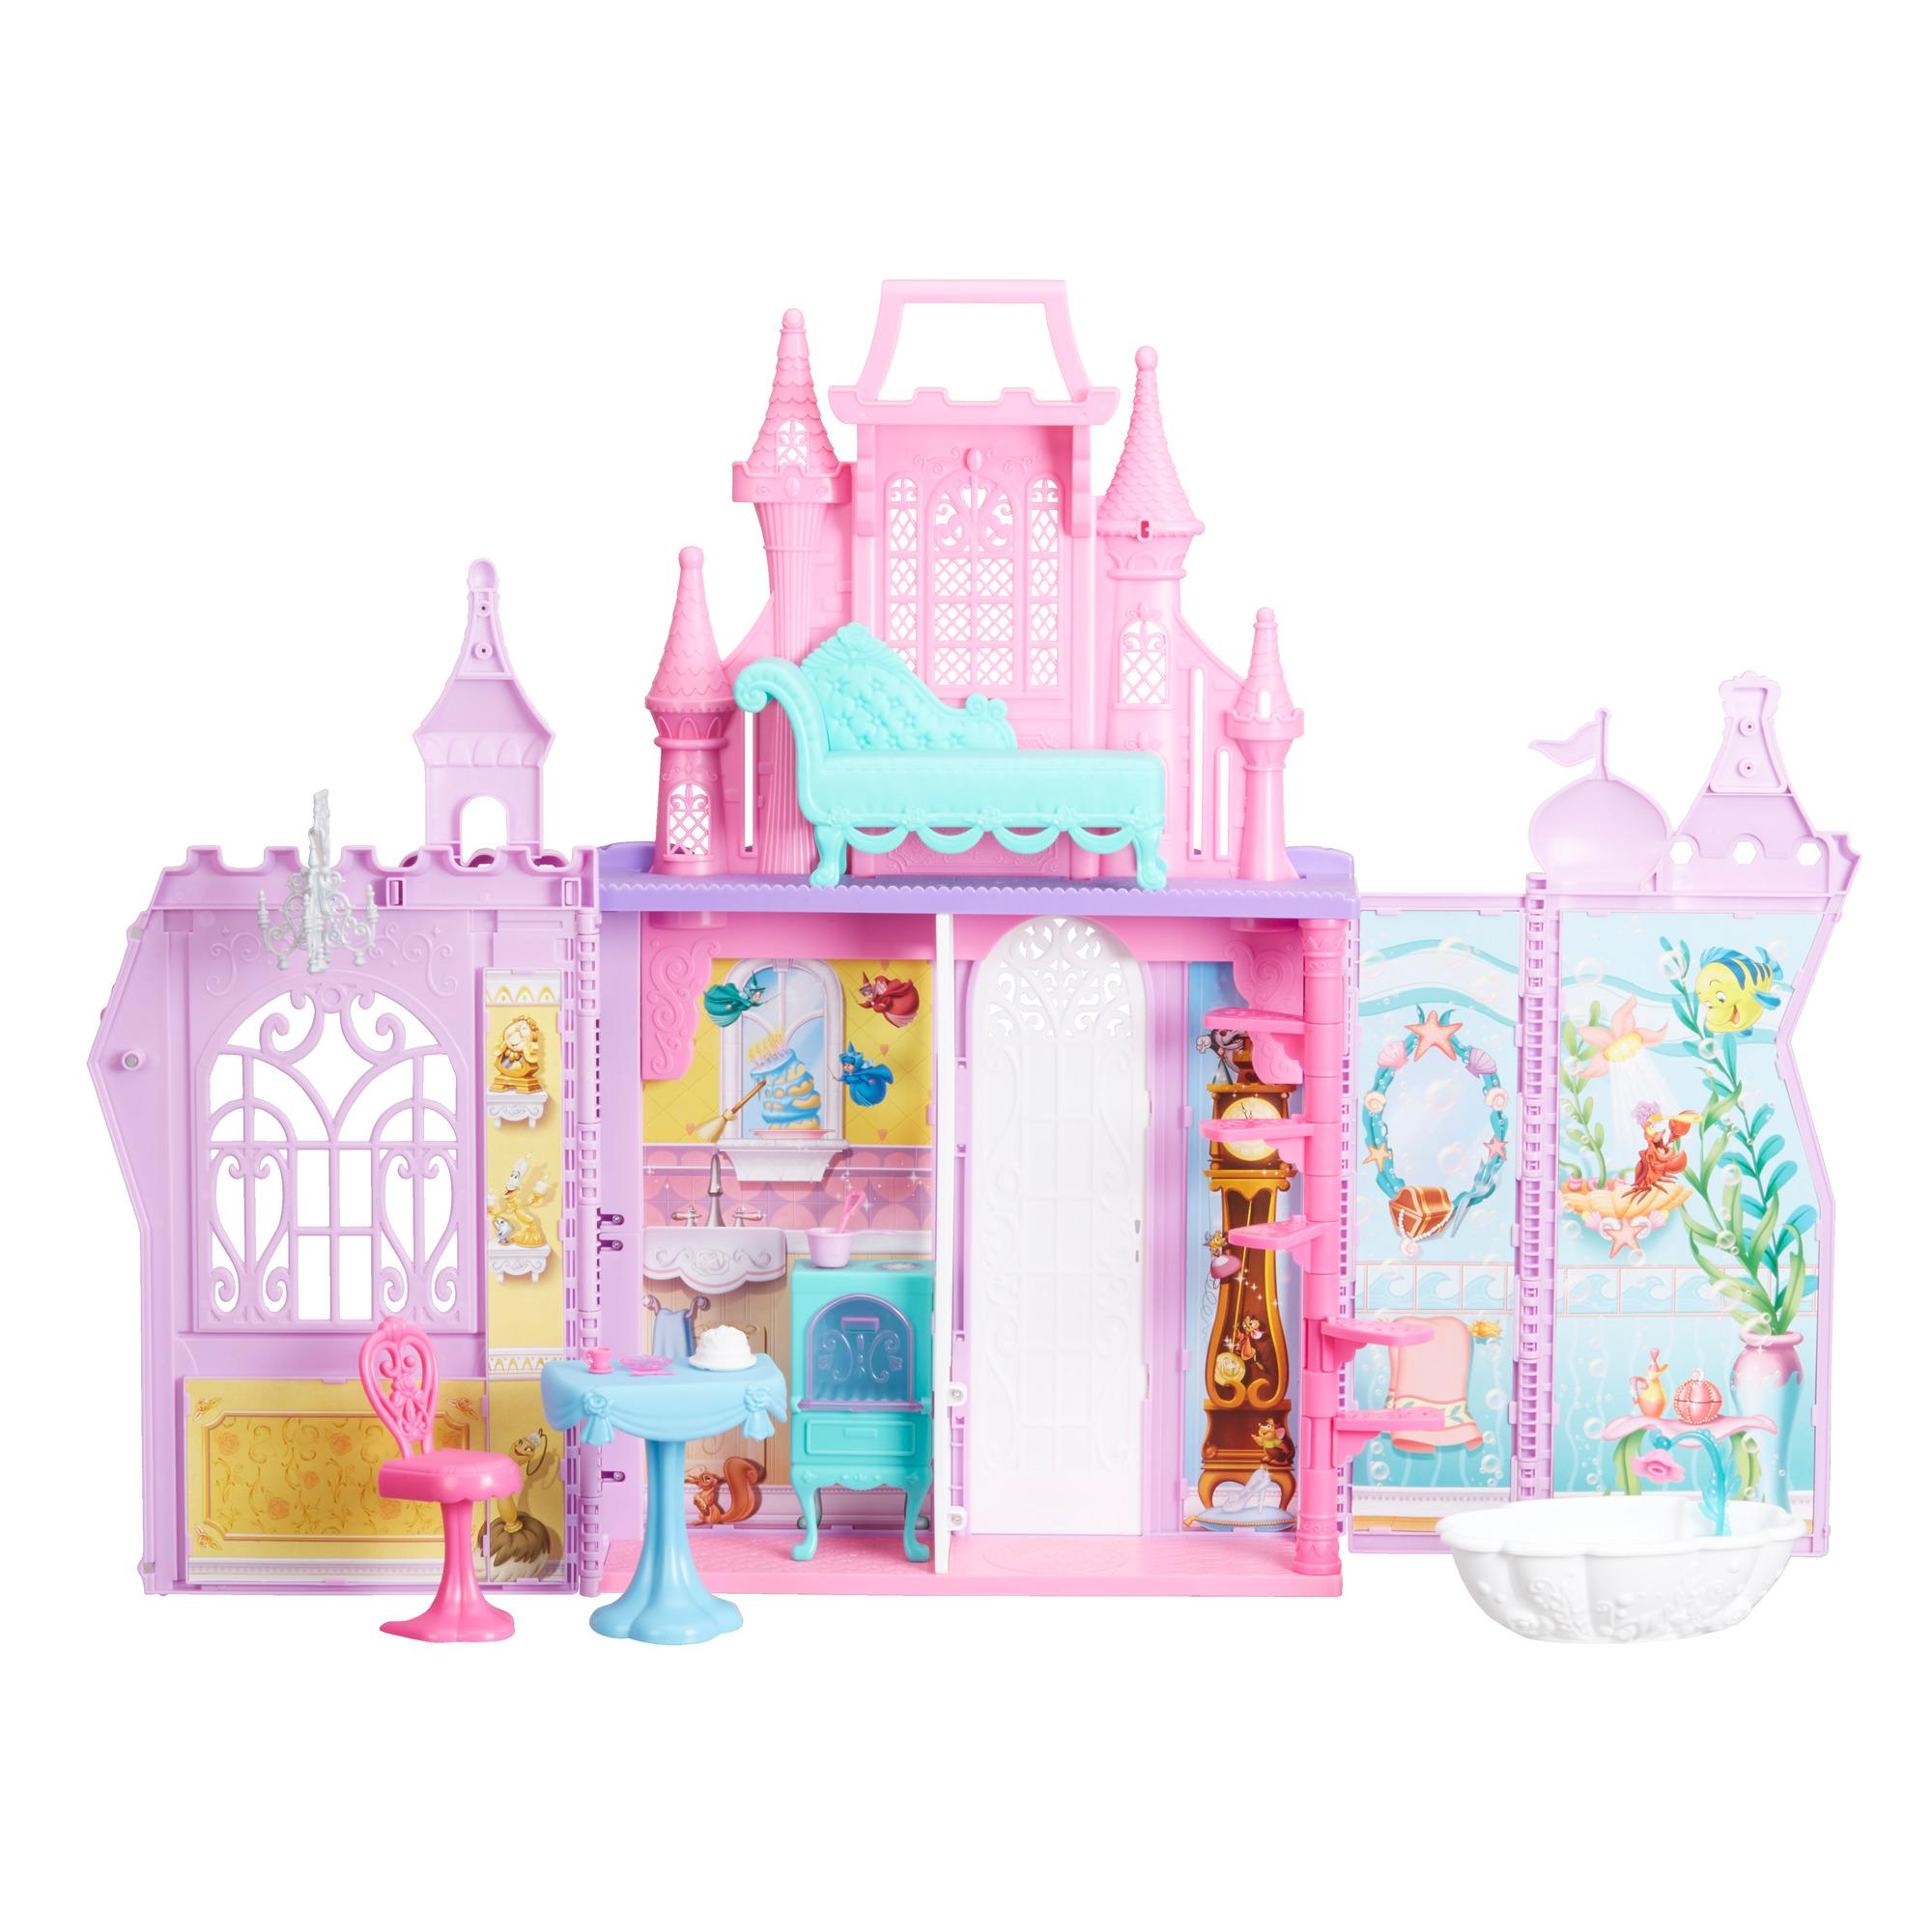 Disney Princess Palacio de princesas